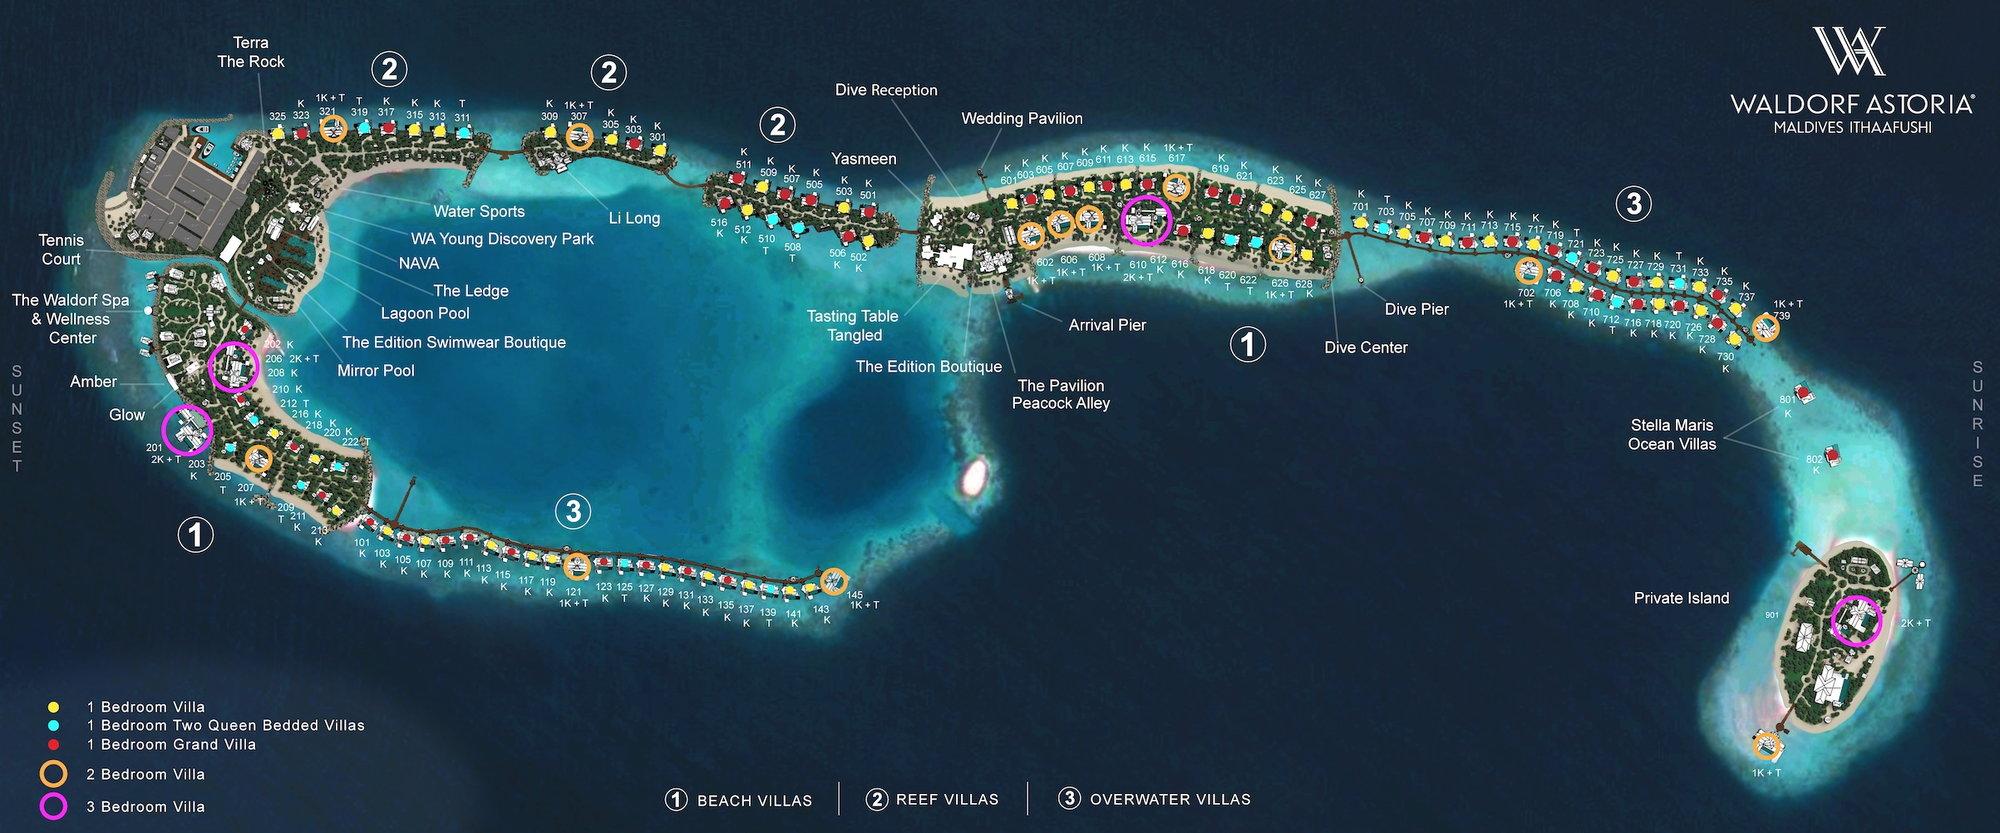 Waldorf Astoria Maldives Ithaafushi Page 163